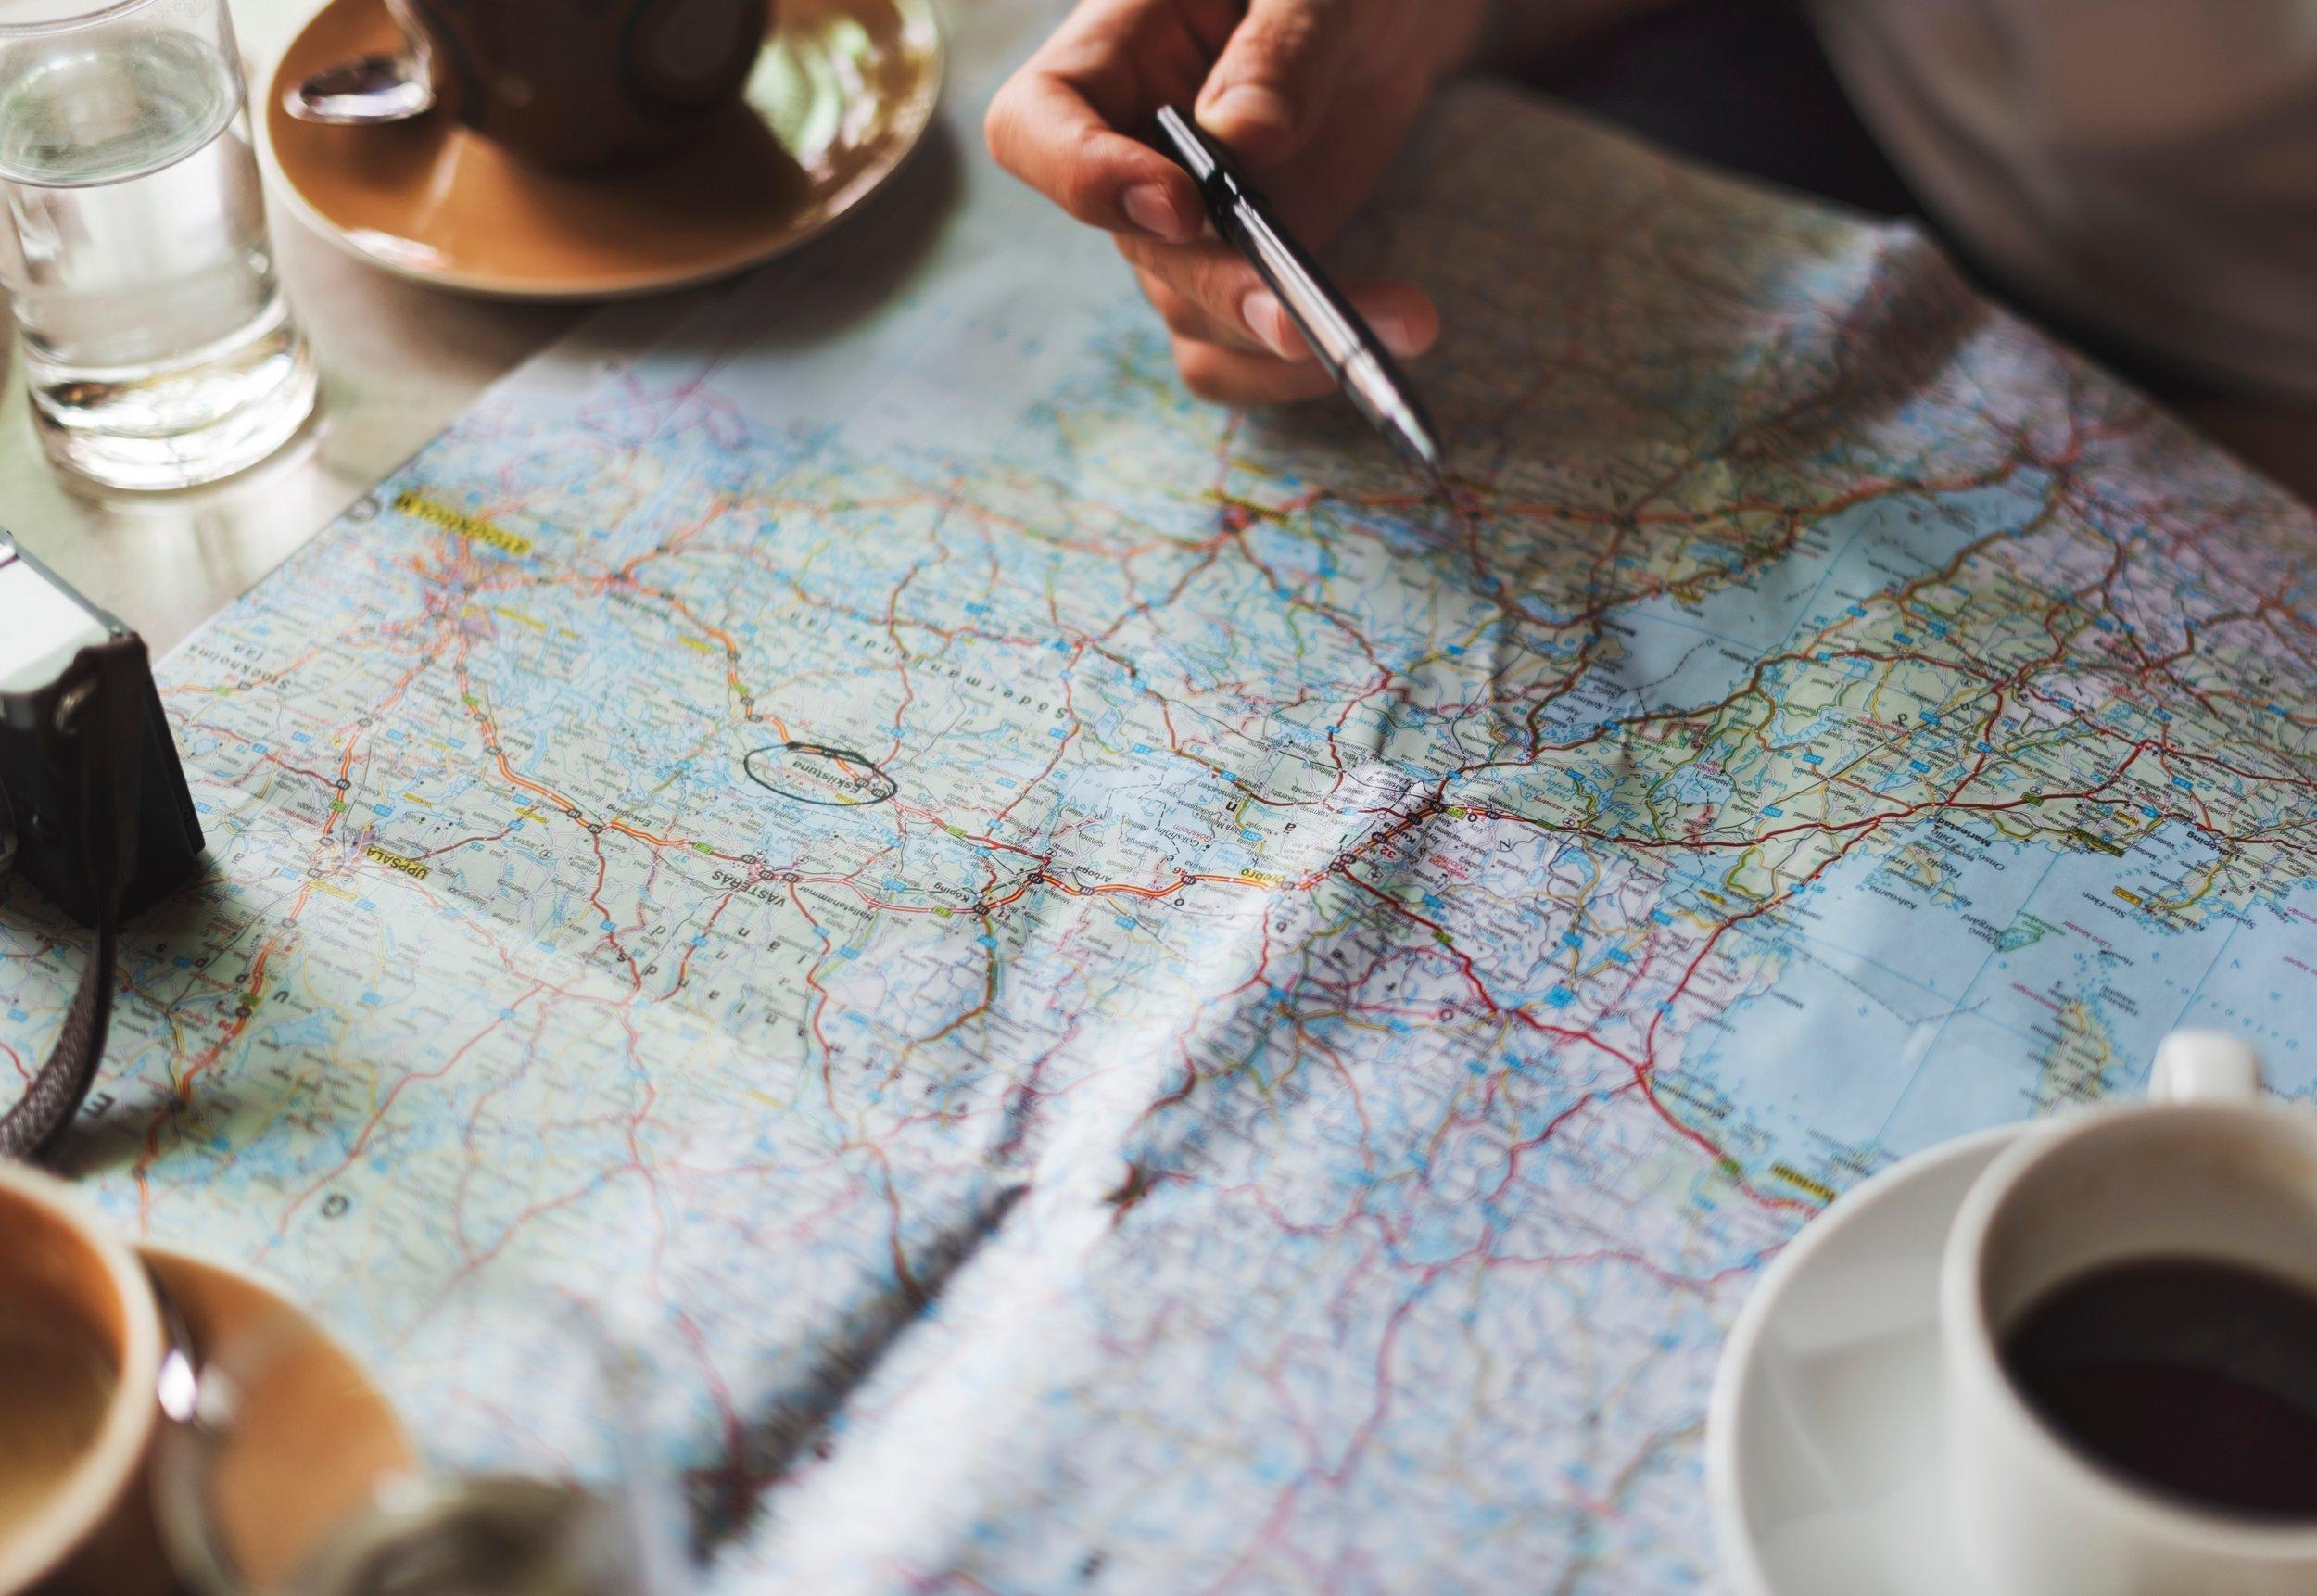 mapping-a-trip.jpg